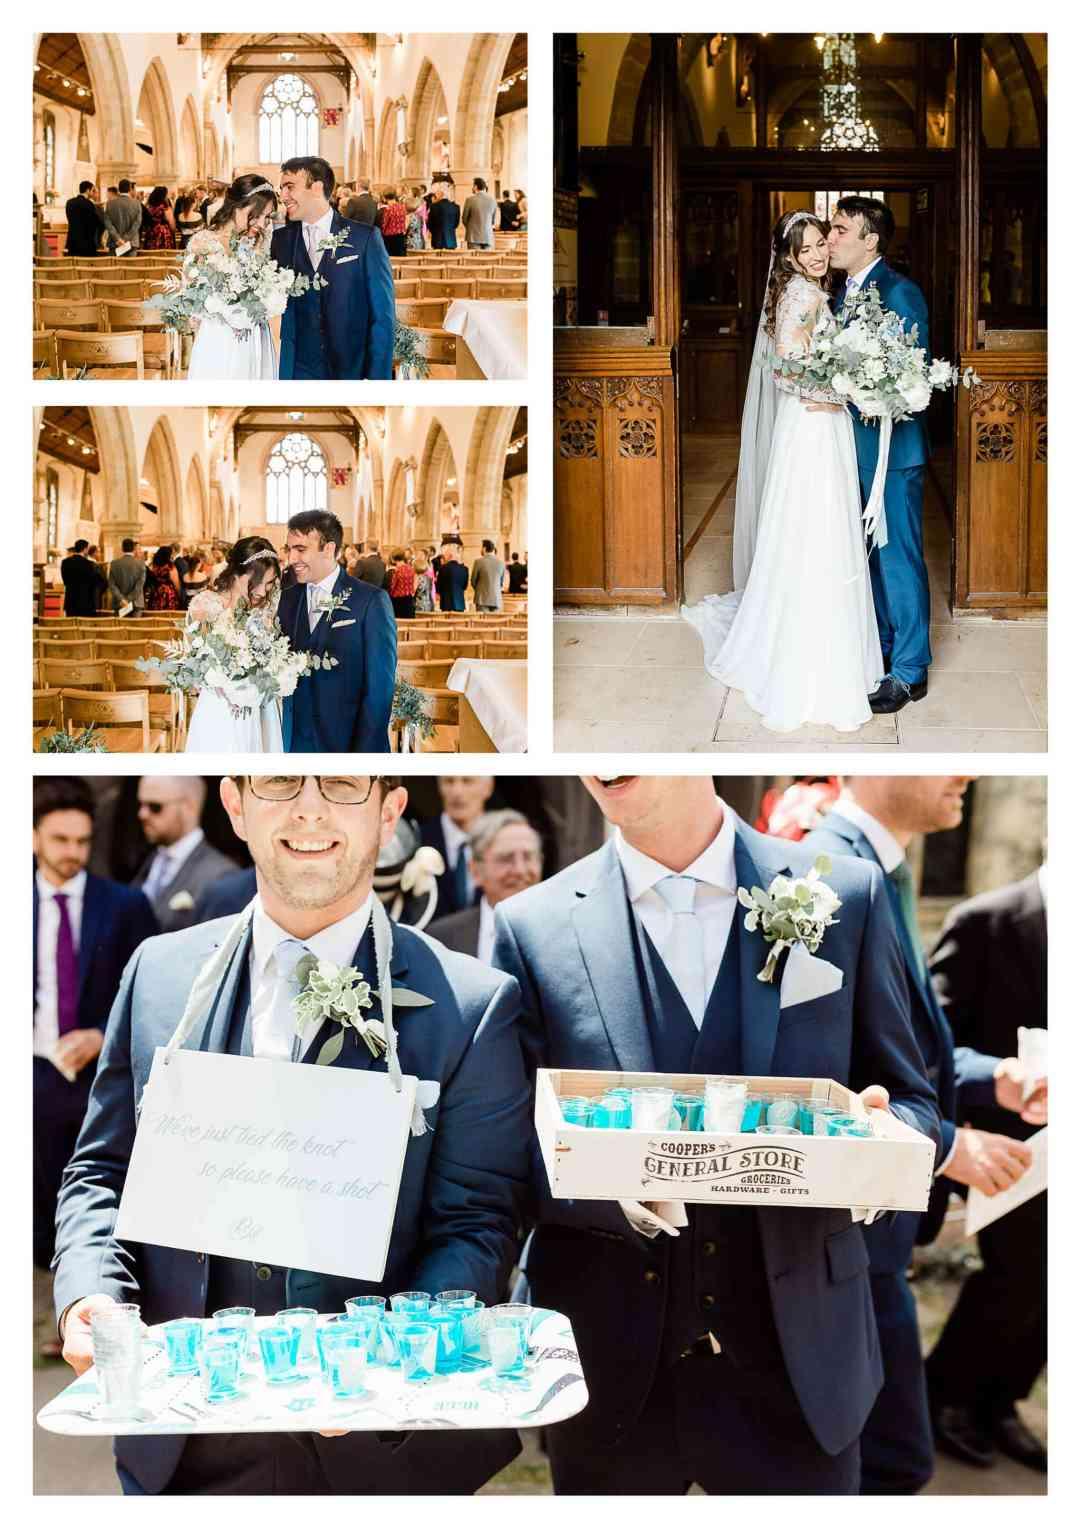 Holy Trinity Church wedding ceremony | Cuckfield wedding photographer